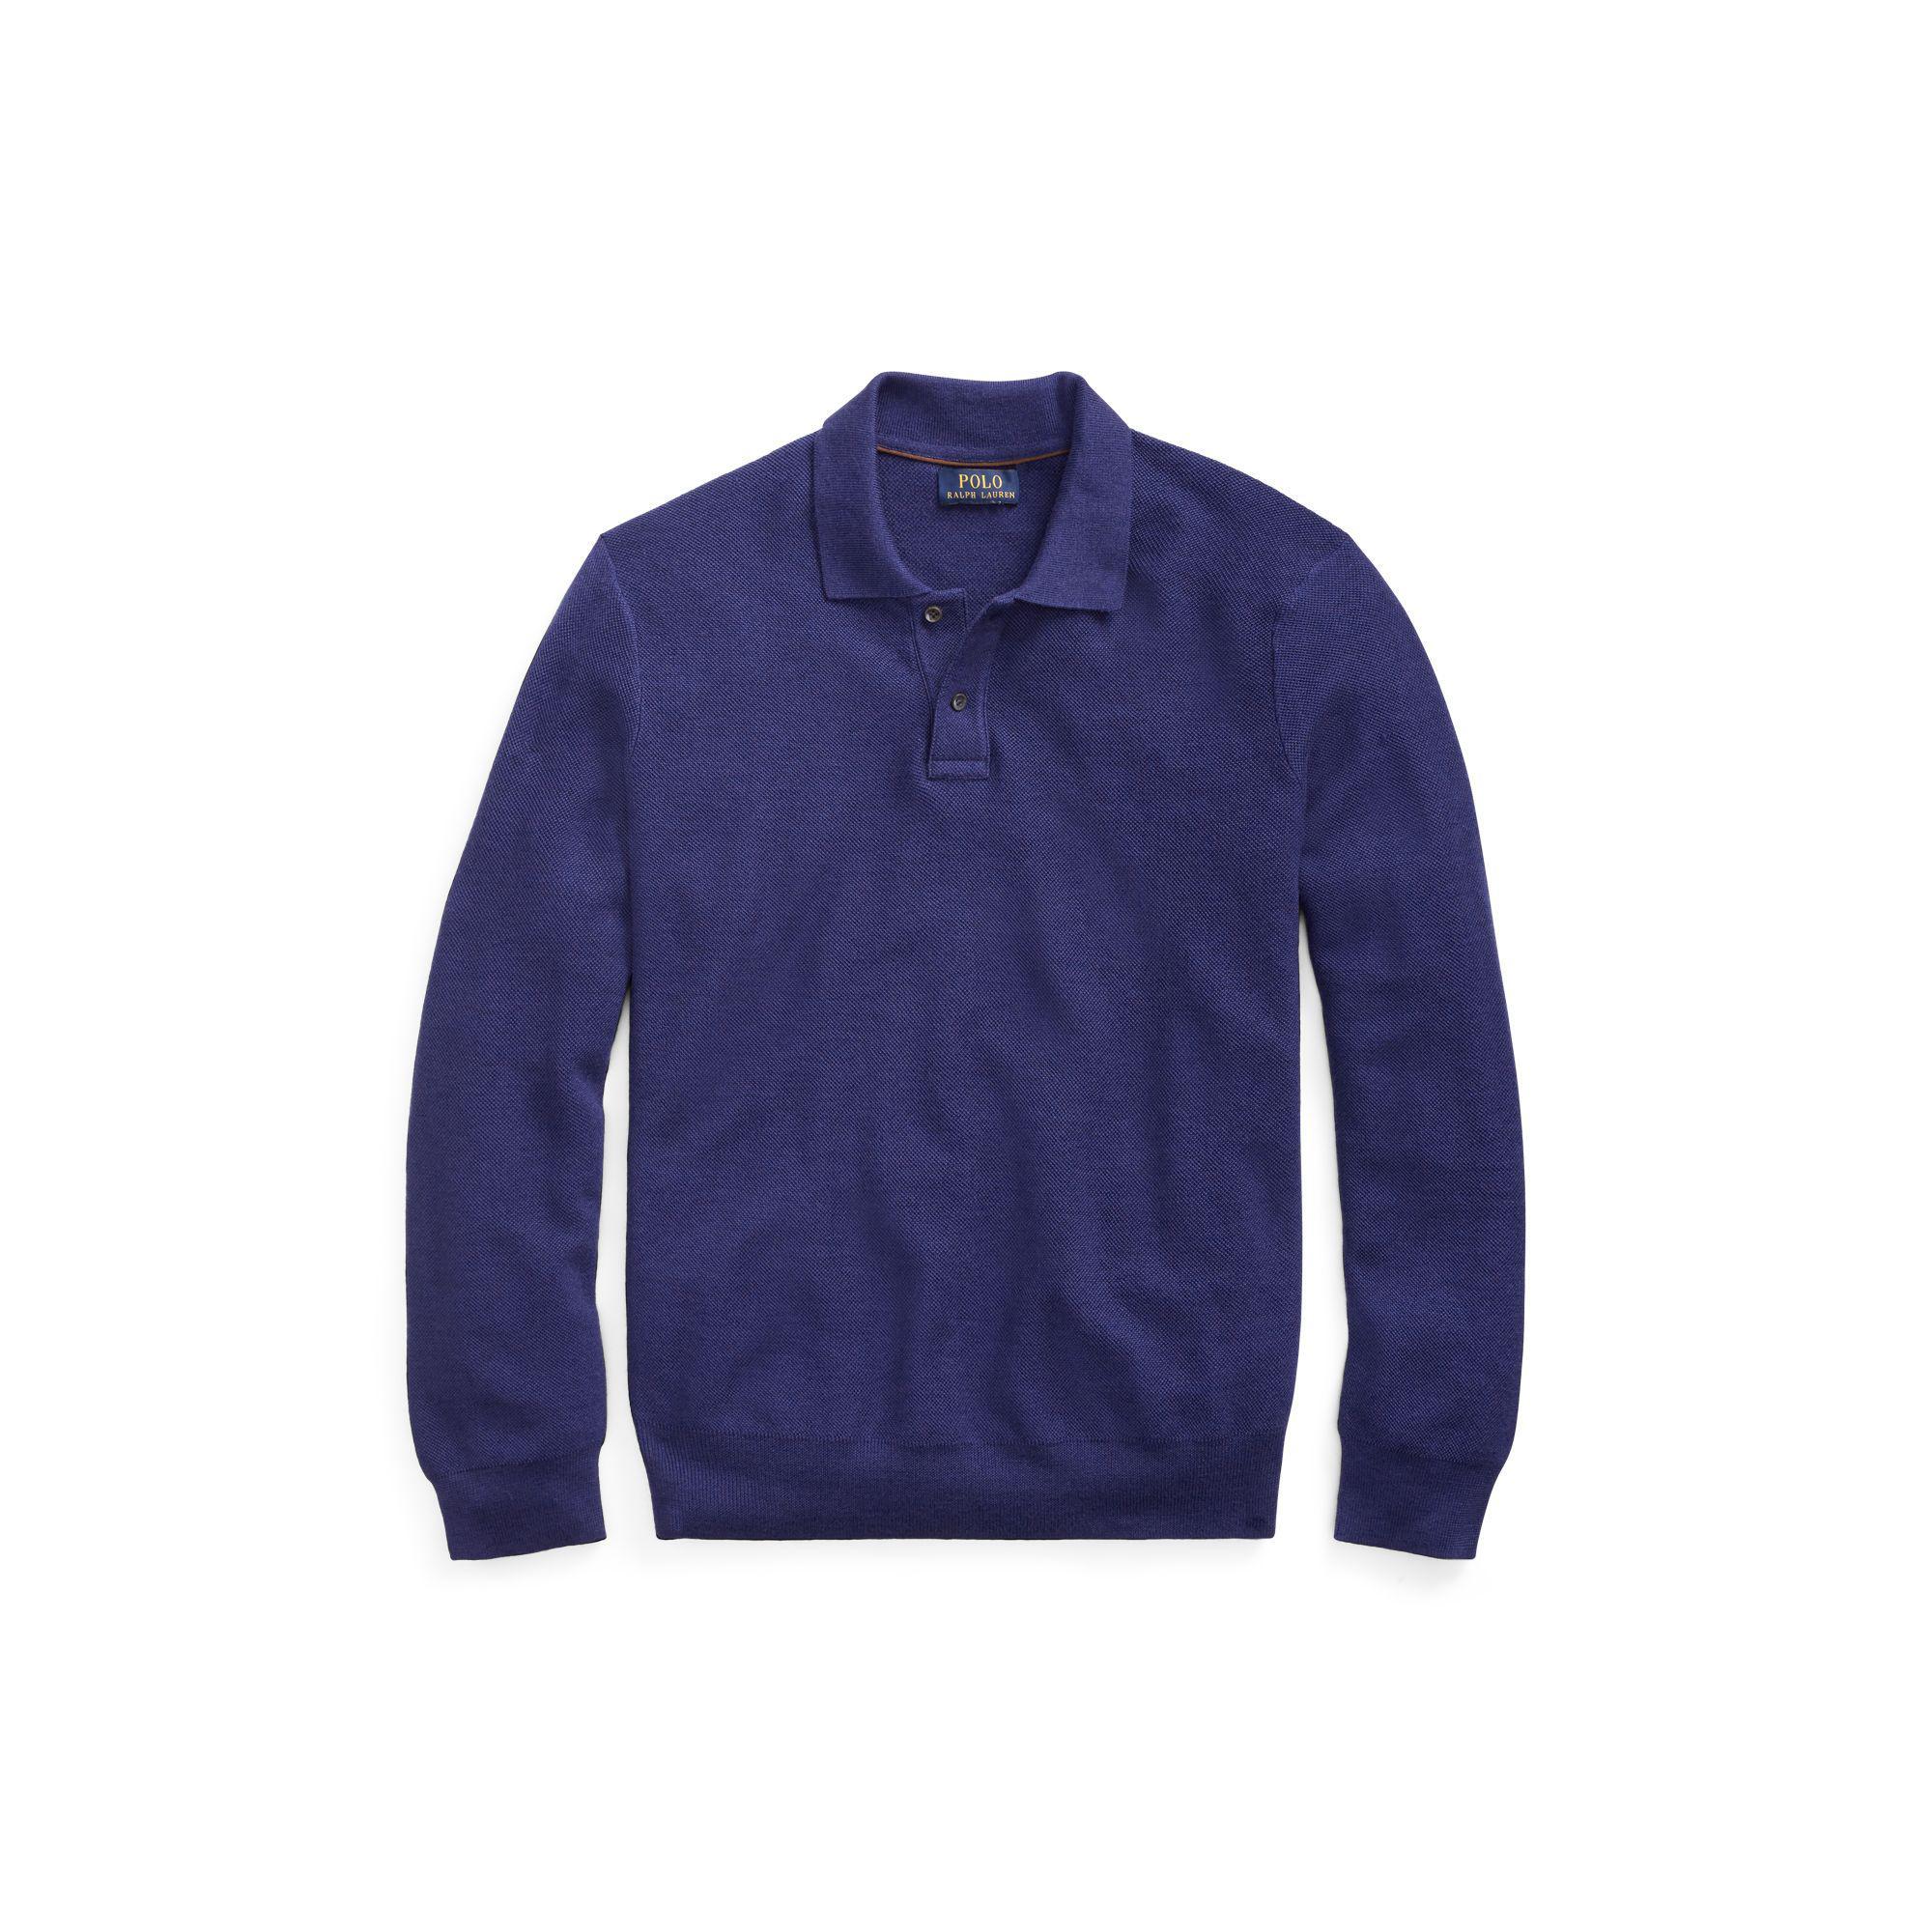 Polo Ralph Lauren - Blue Merino-silk-cashmere Sweater for Men - Lyst. View  fullscreen